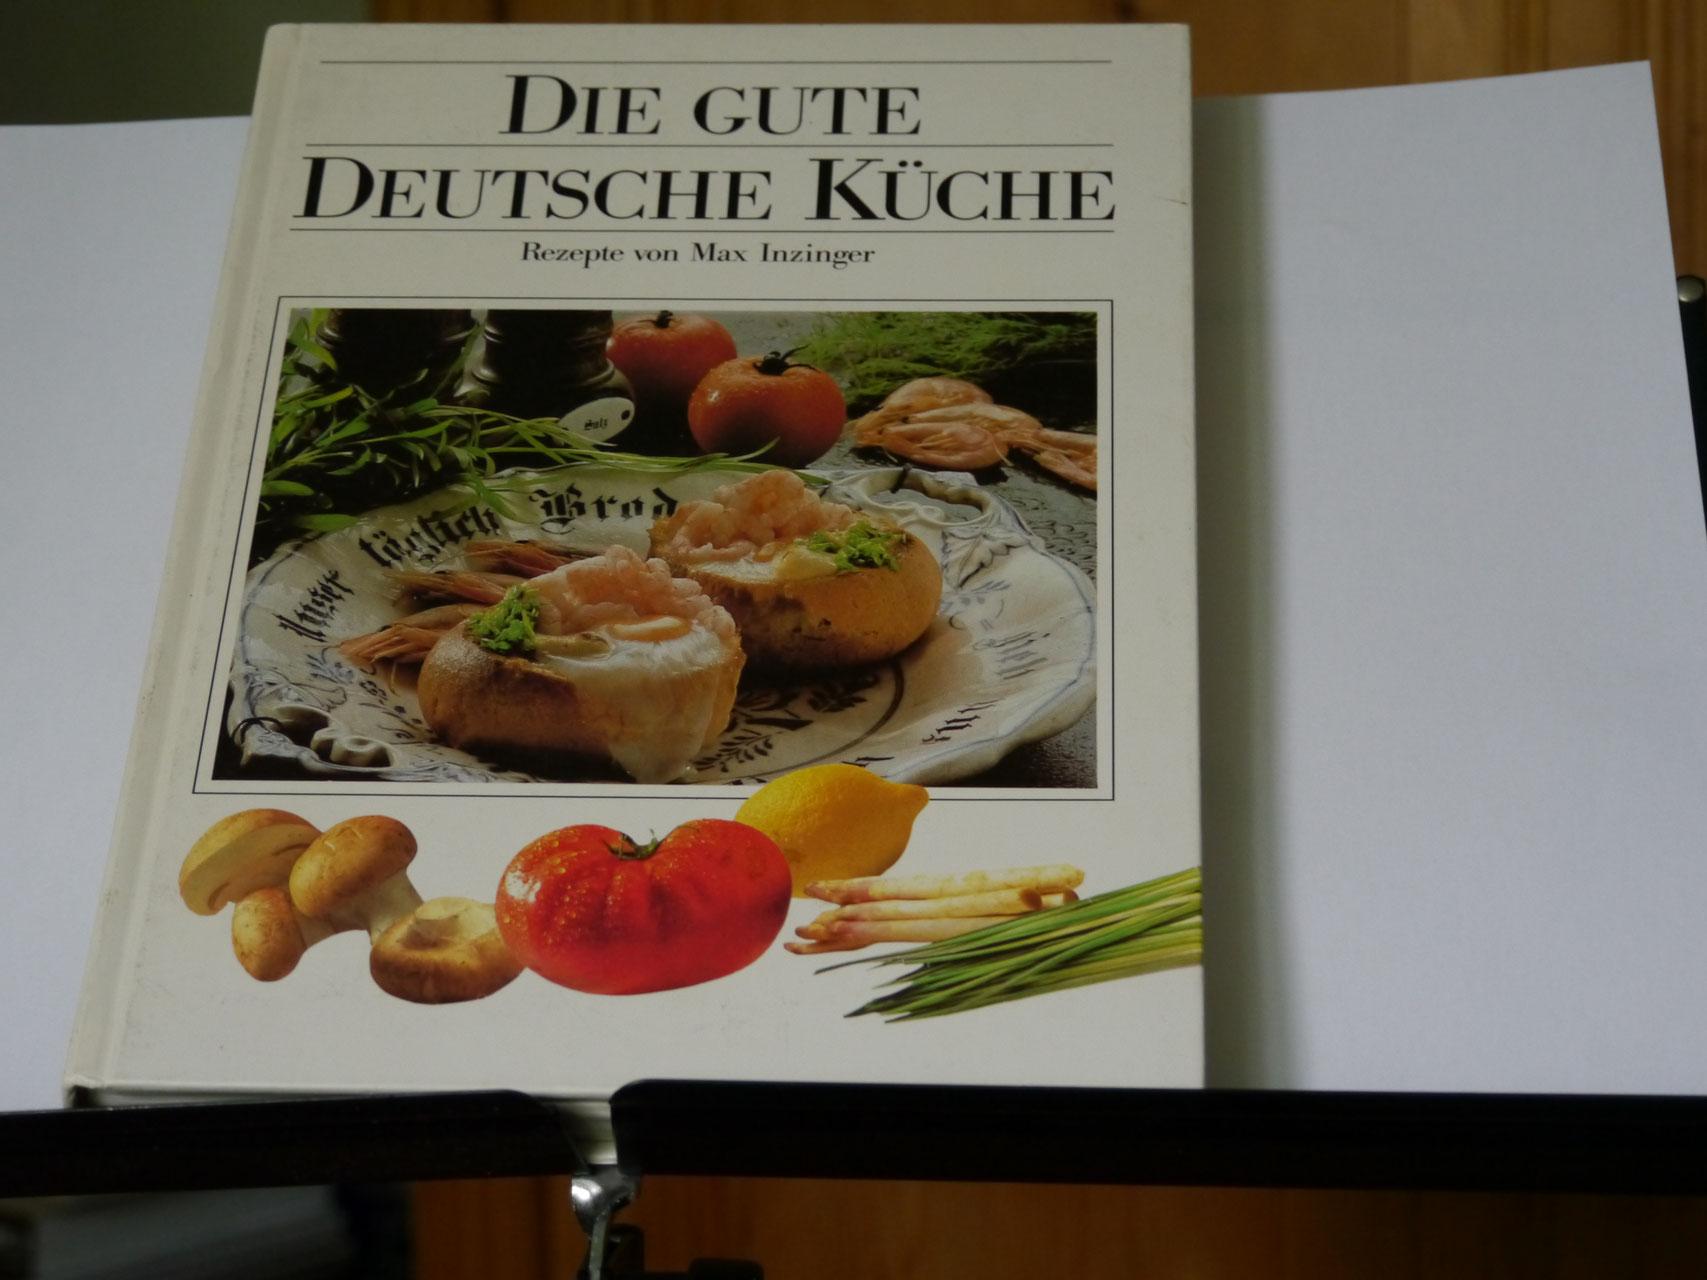 Kochen - buechertafels Webseite!